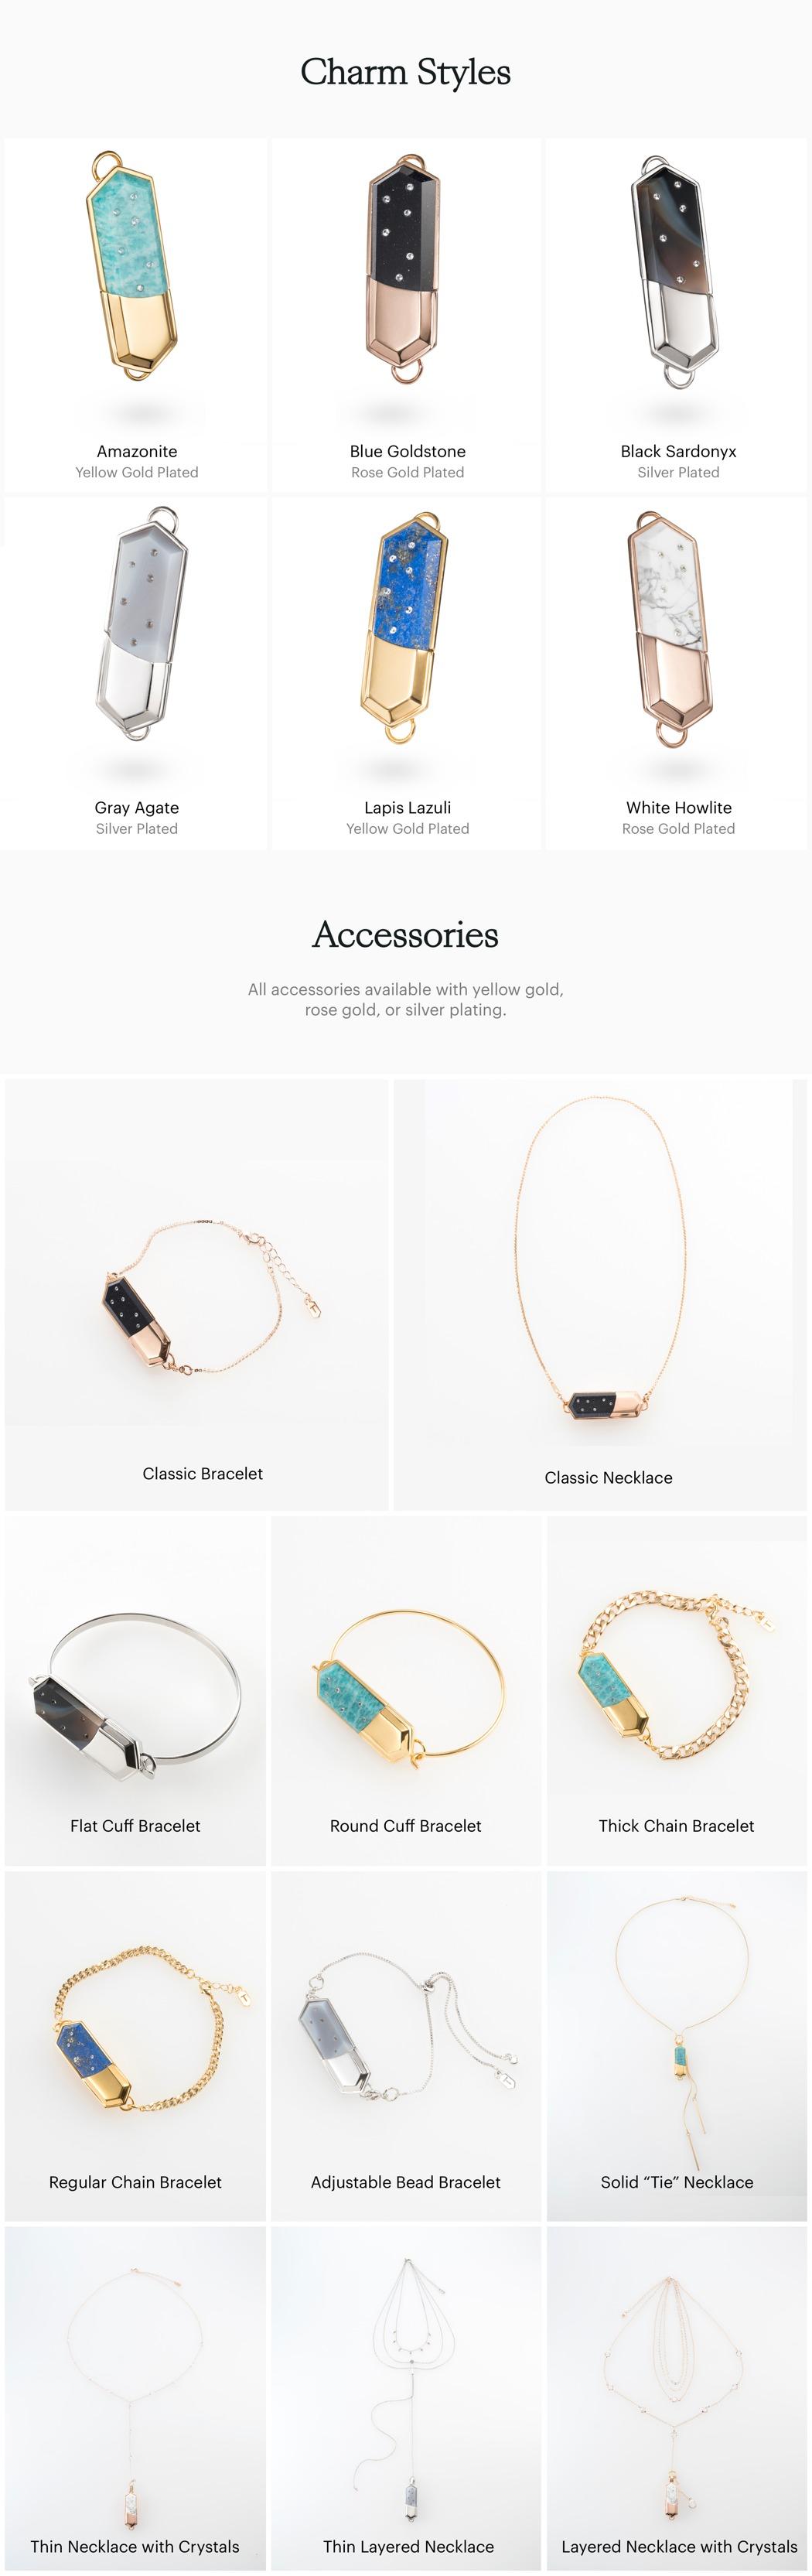 talsam_smart_jewelry_15